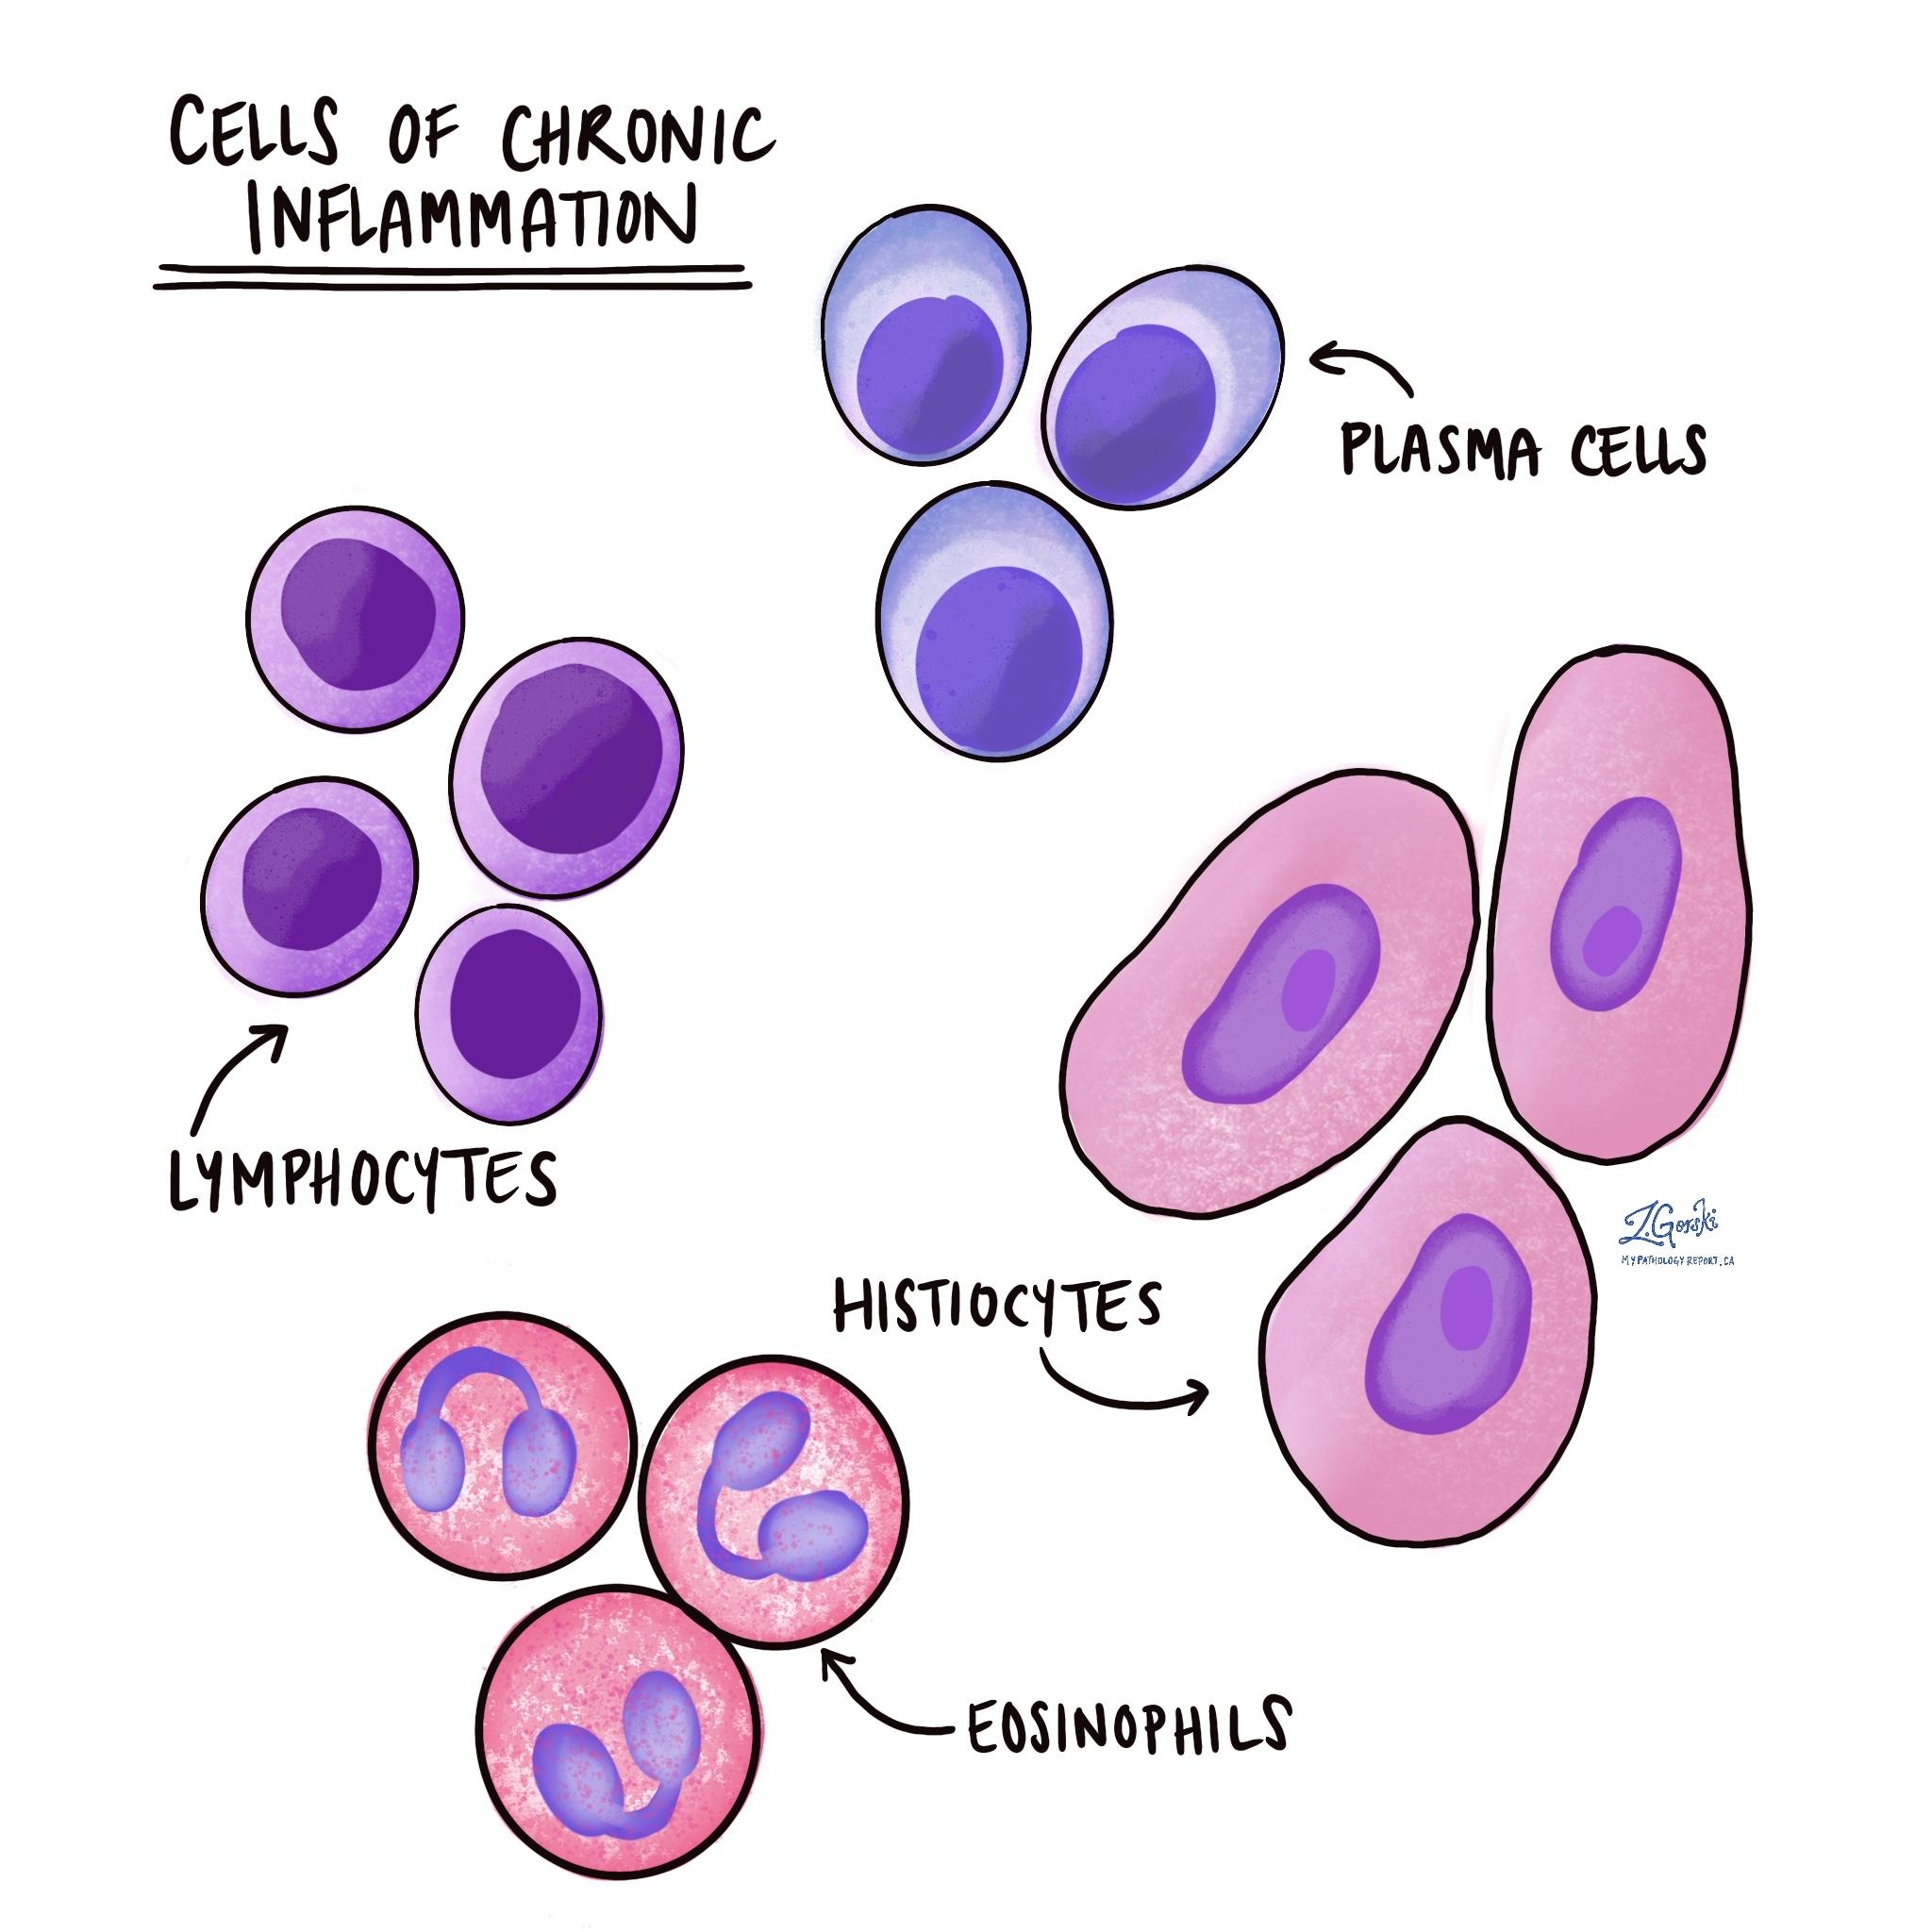 chronic inflammatory cells